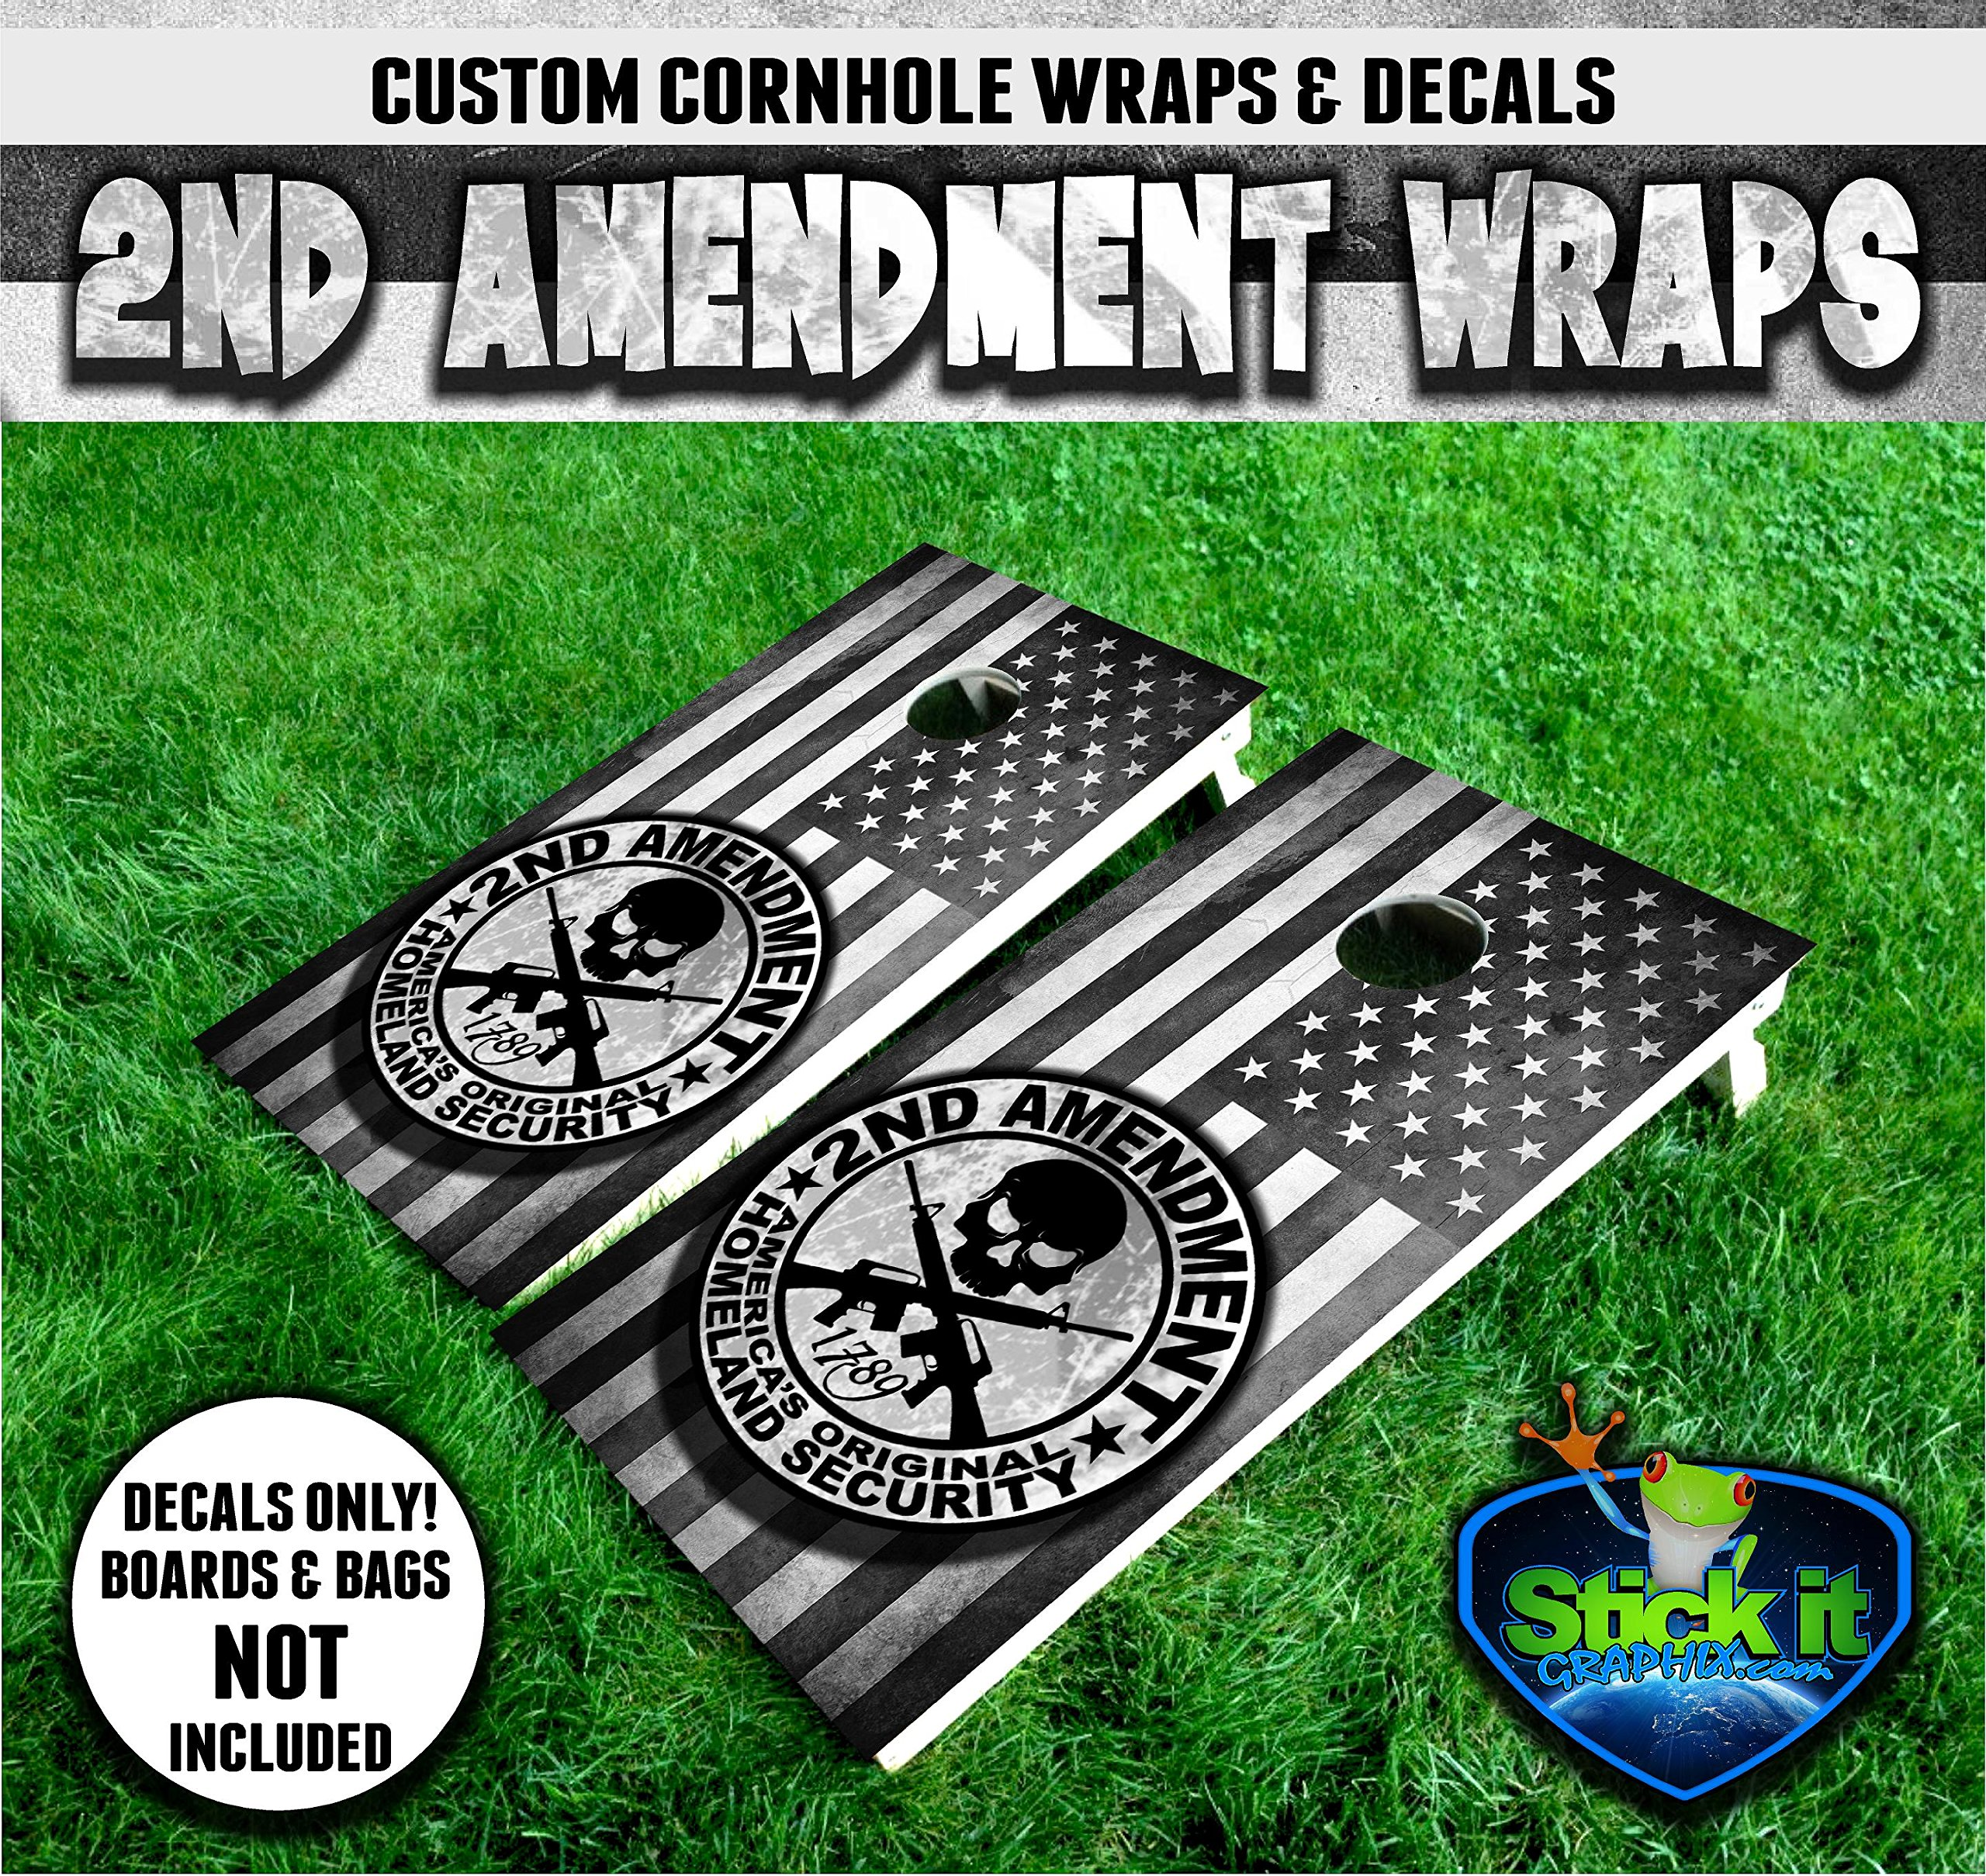 2nd Second Amendment Wrap set! 2x Decals 24'' x 48'' Skull Cross Rifles Black White Grey Scale Grunge US Flag logo graphics for cornhole baggo Bag Toss boards game